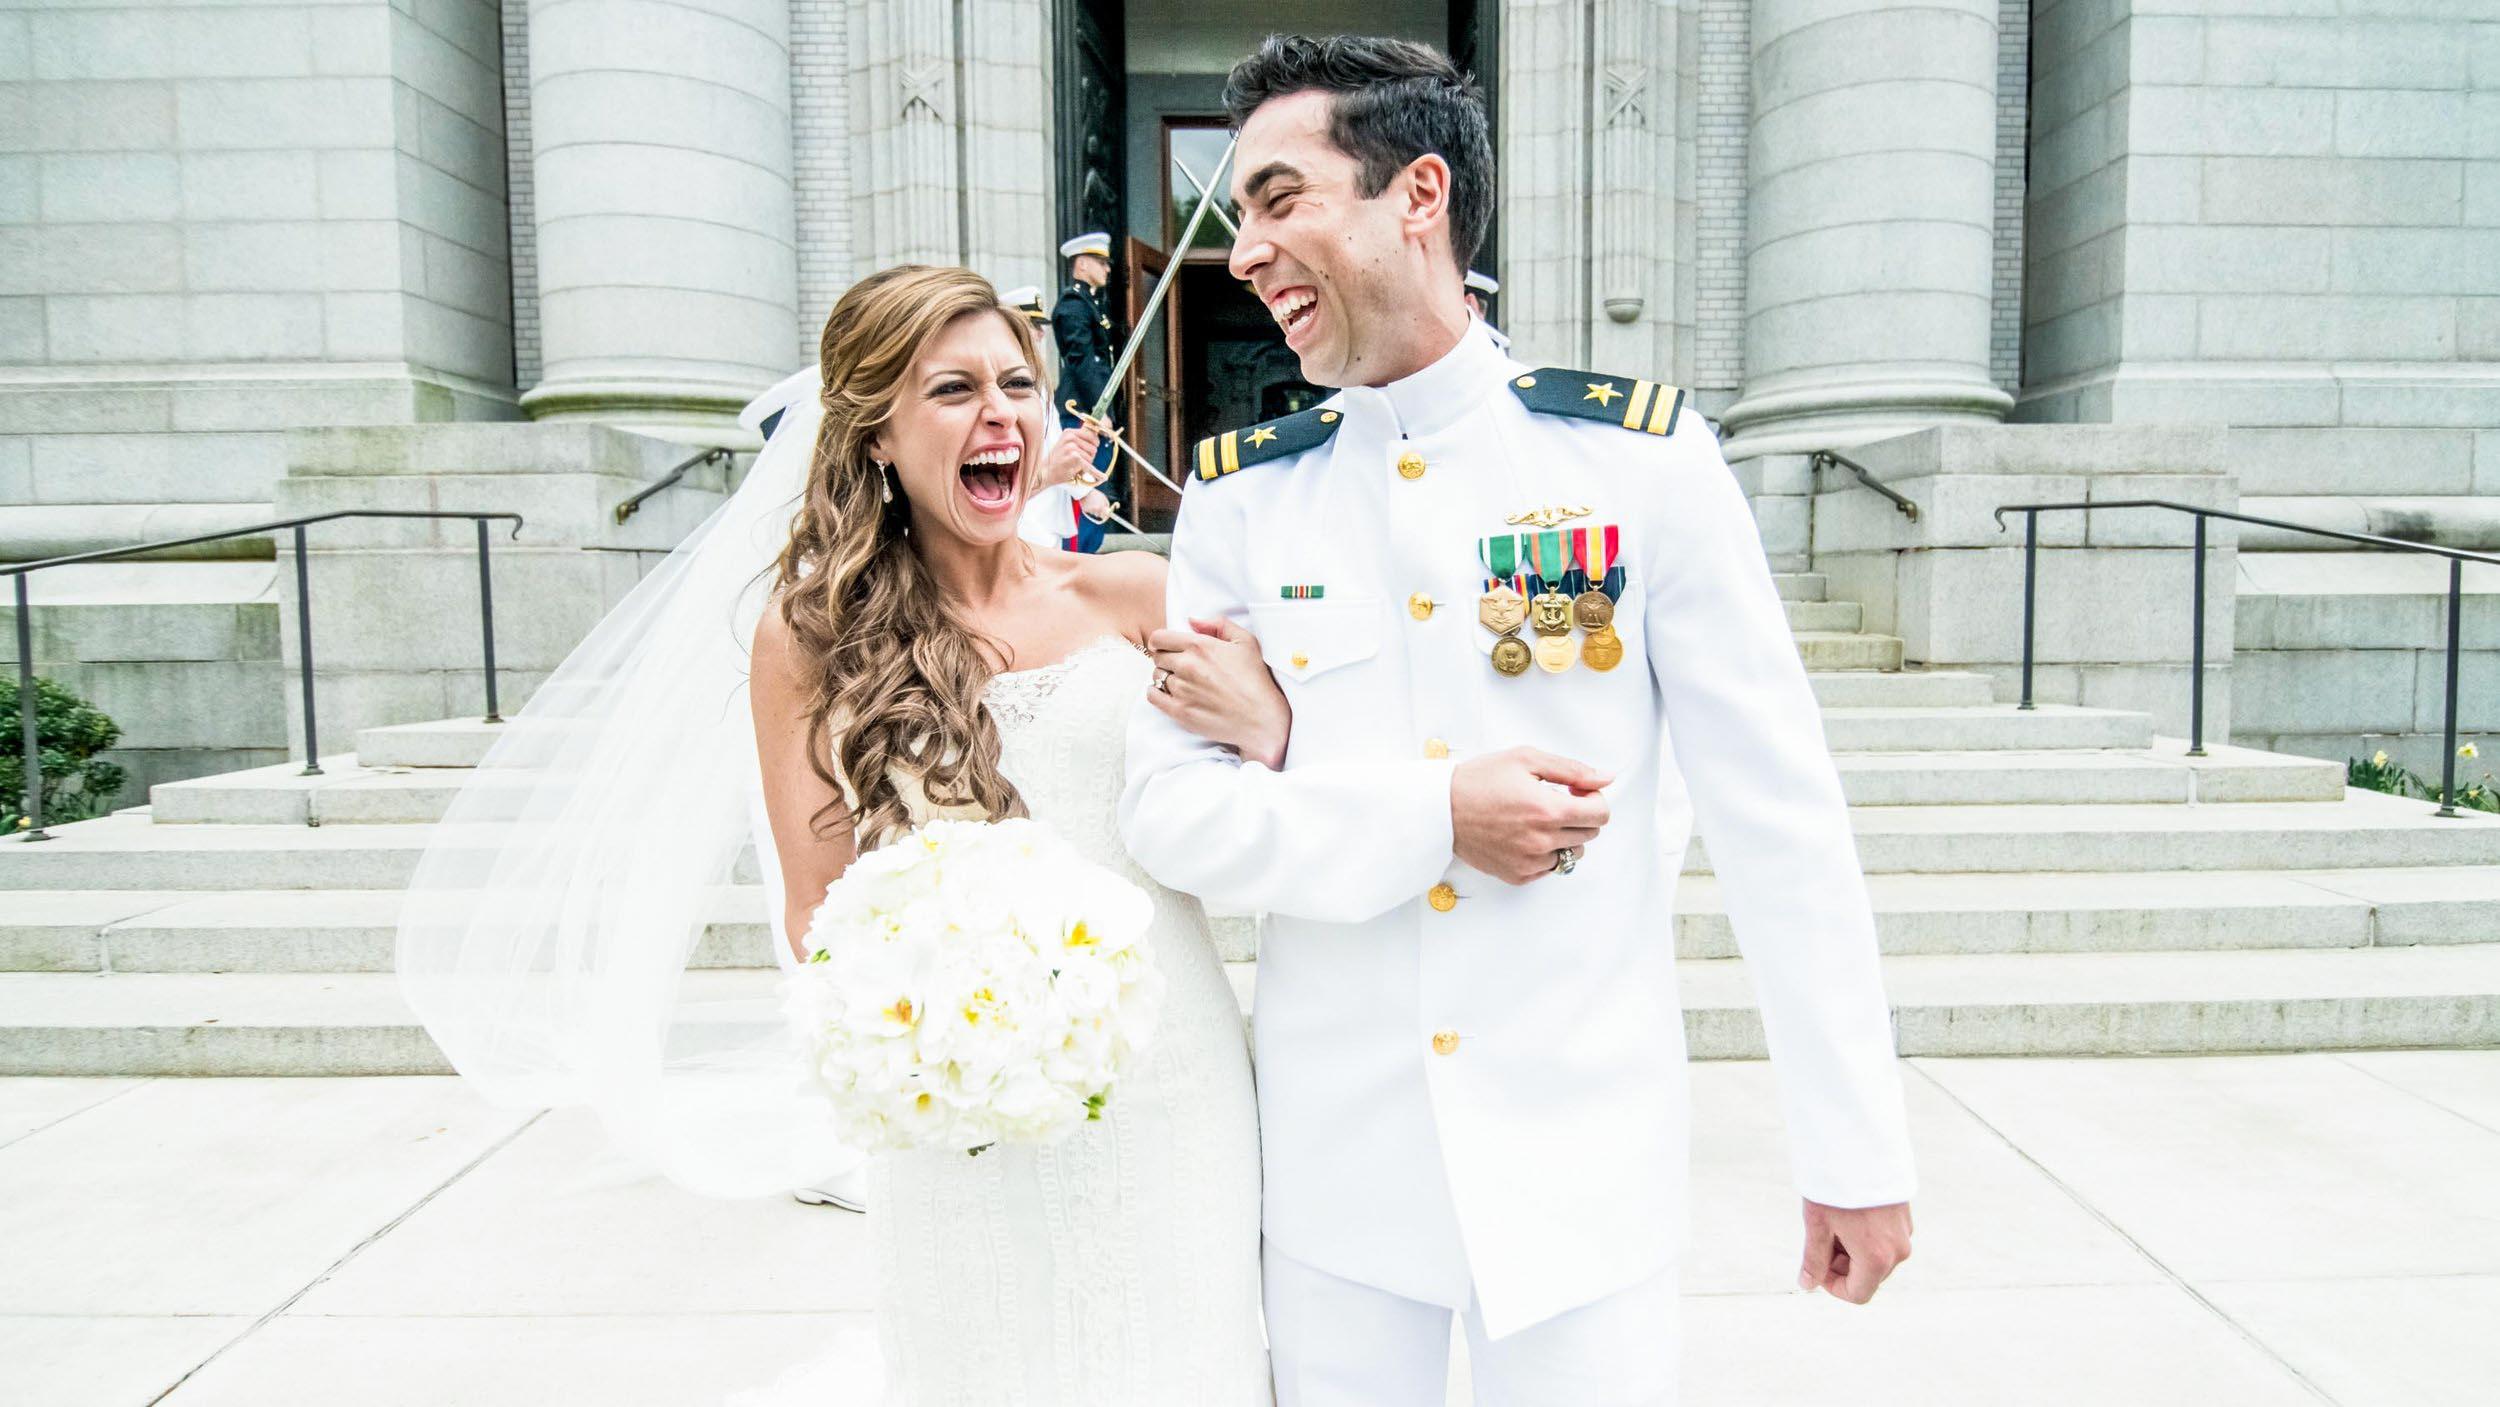 dc+metro+wedding+photographer+vadym+guliuk+photography+wedding+ceremony-2030.jpg